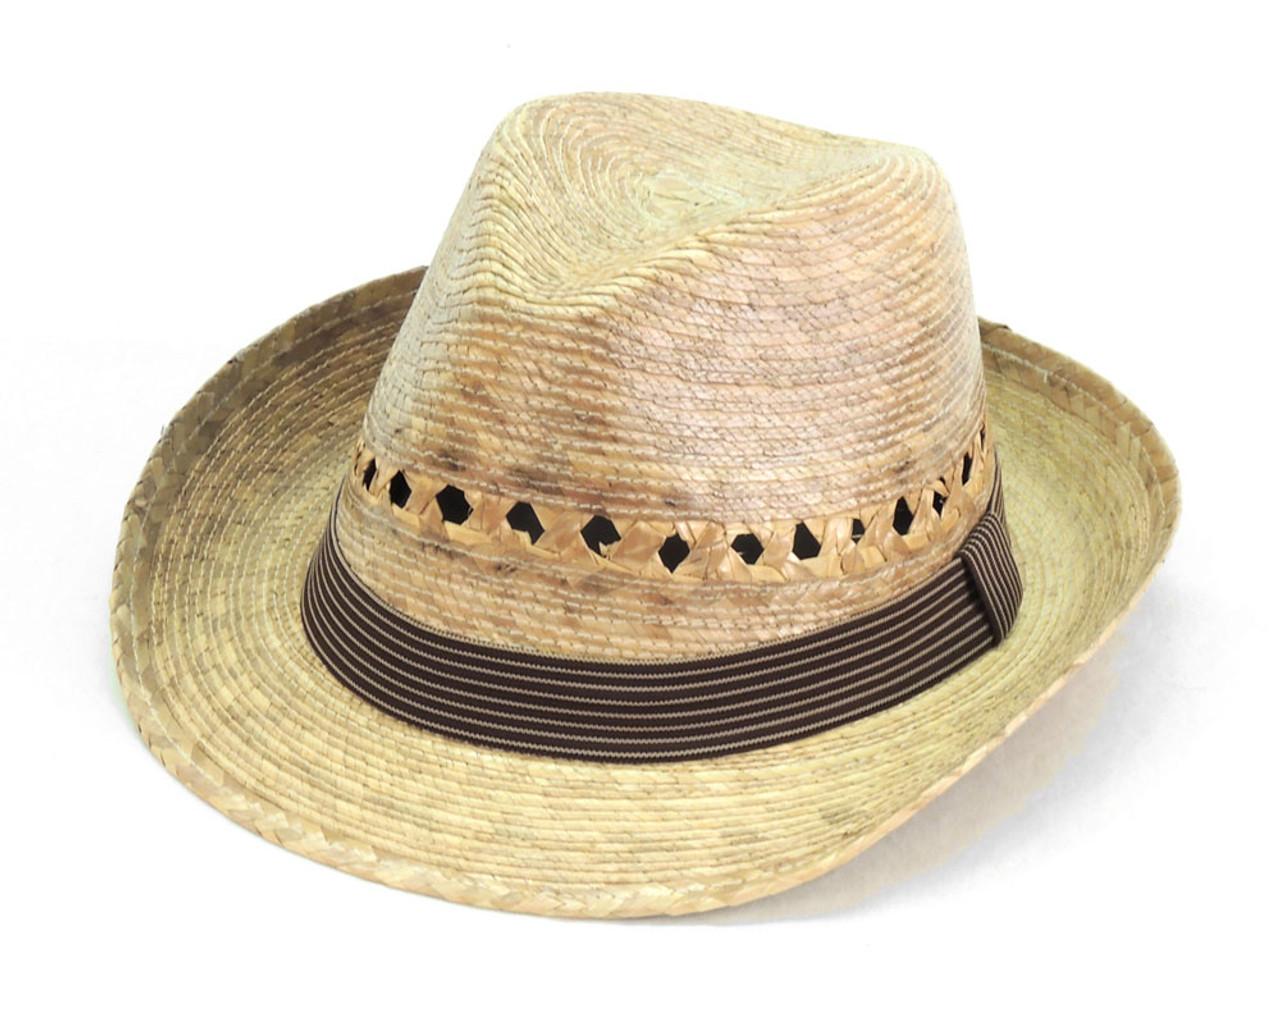 2de3d7461d788 Denison Palm Straw Hat with Band Fine Brim Adjustable - Sanyork Fair Trade